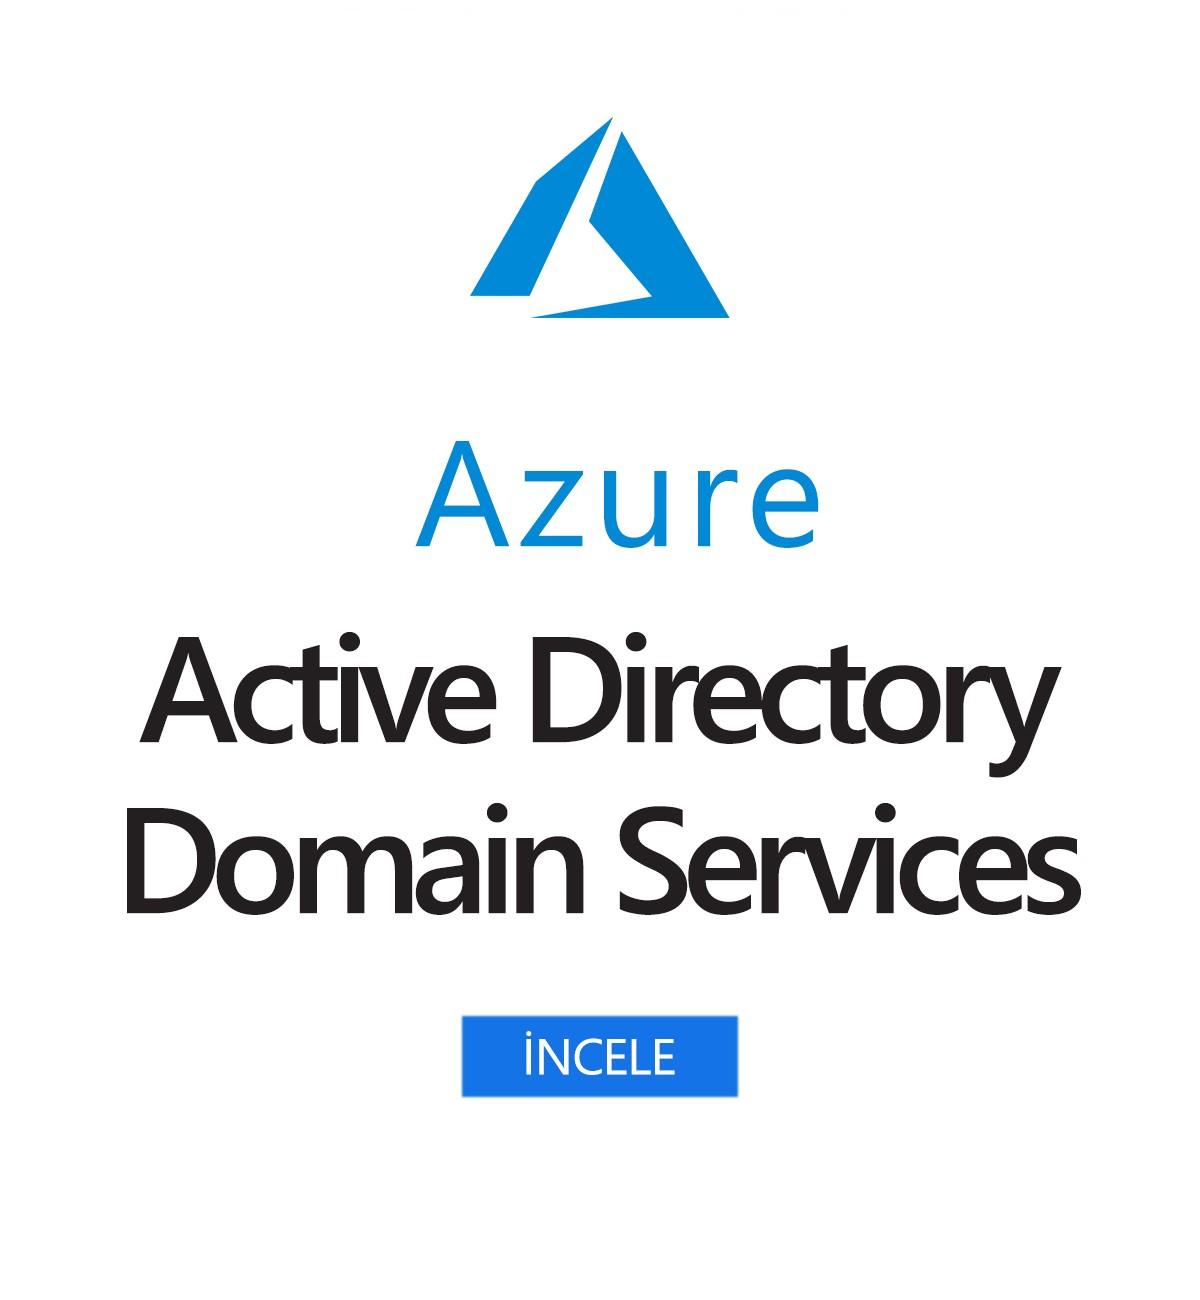 Azure Active Directory Domain Services